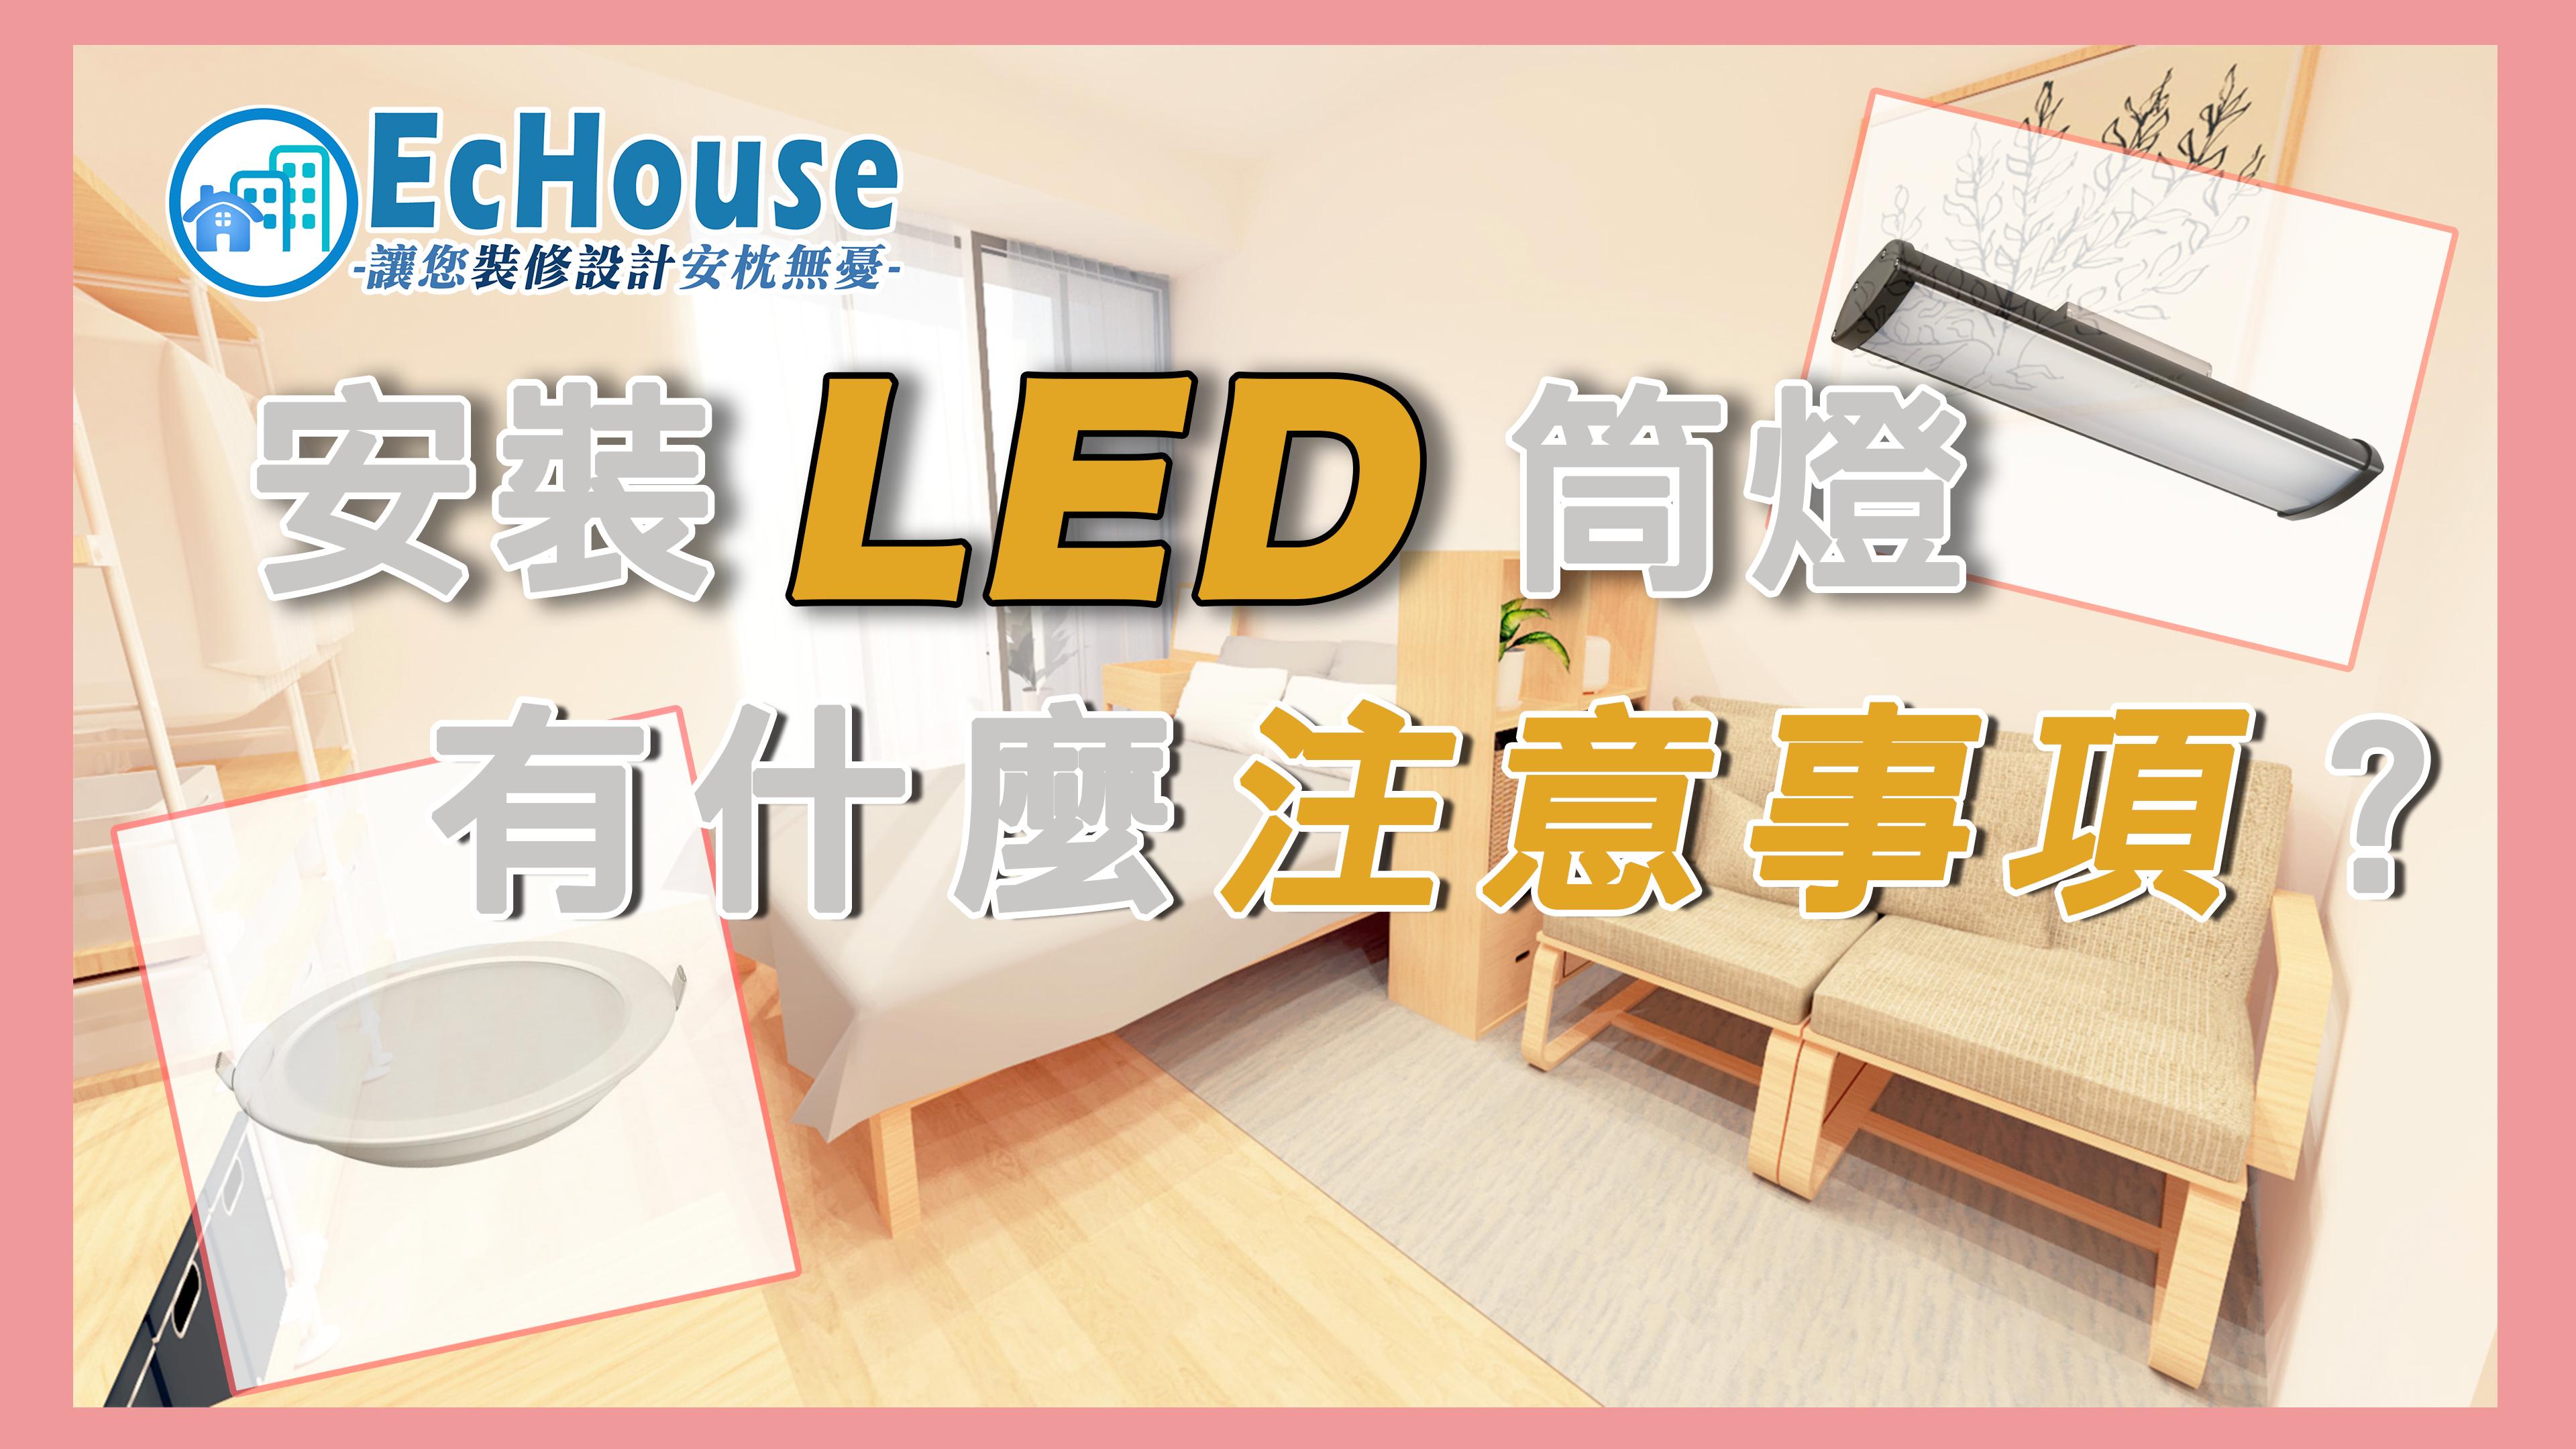 安裝LED筒燈有什麼注意事項?